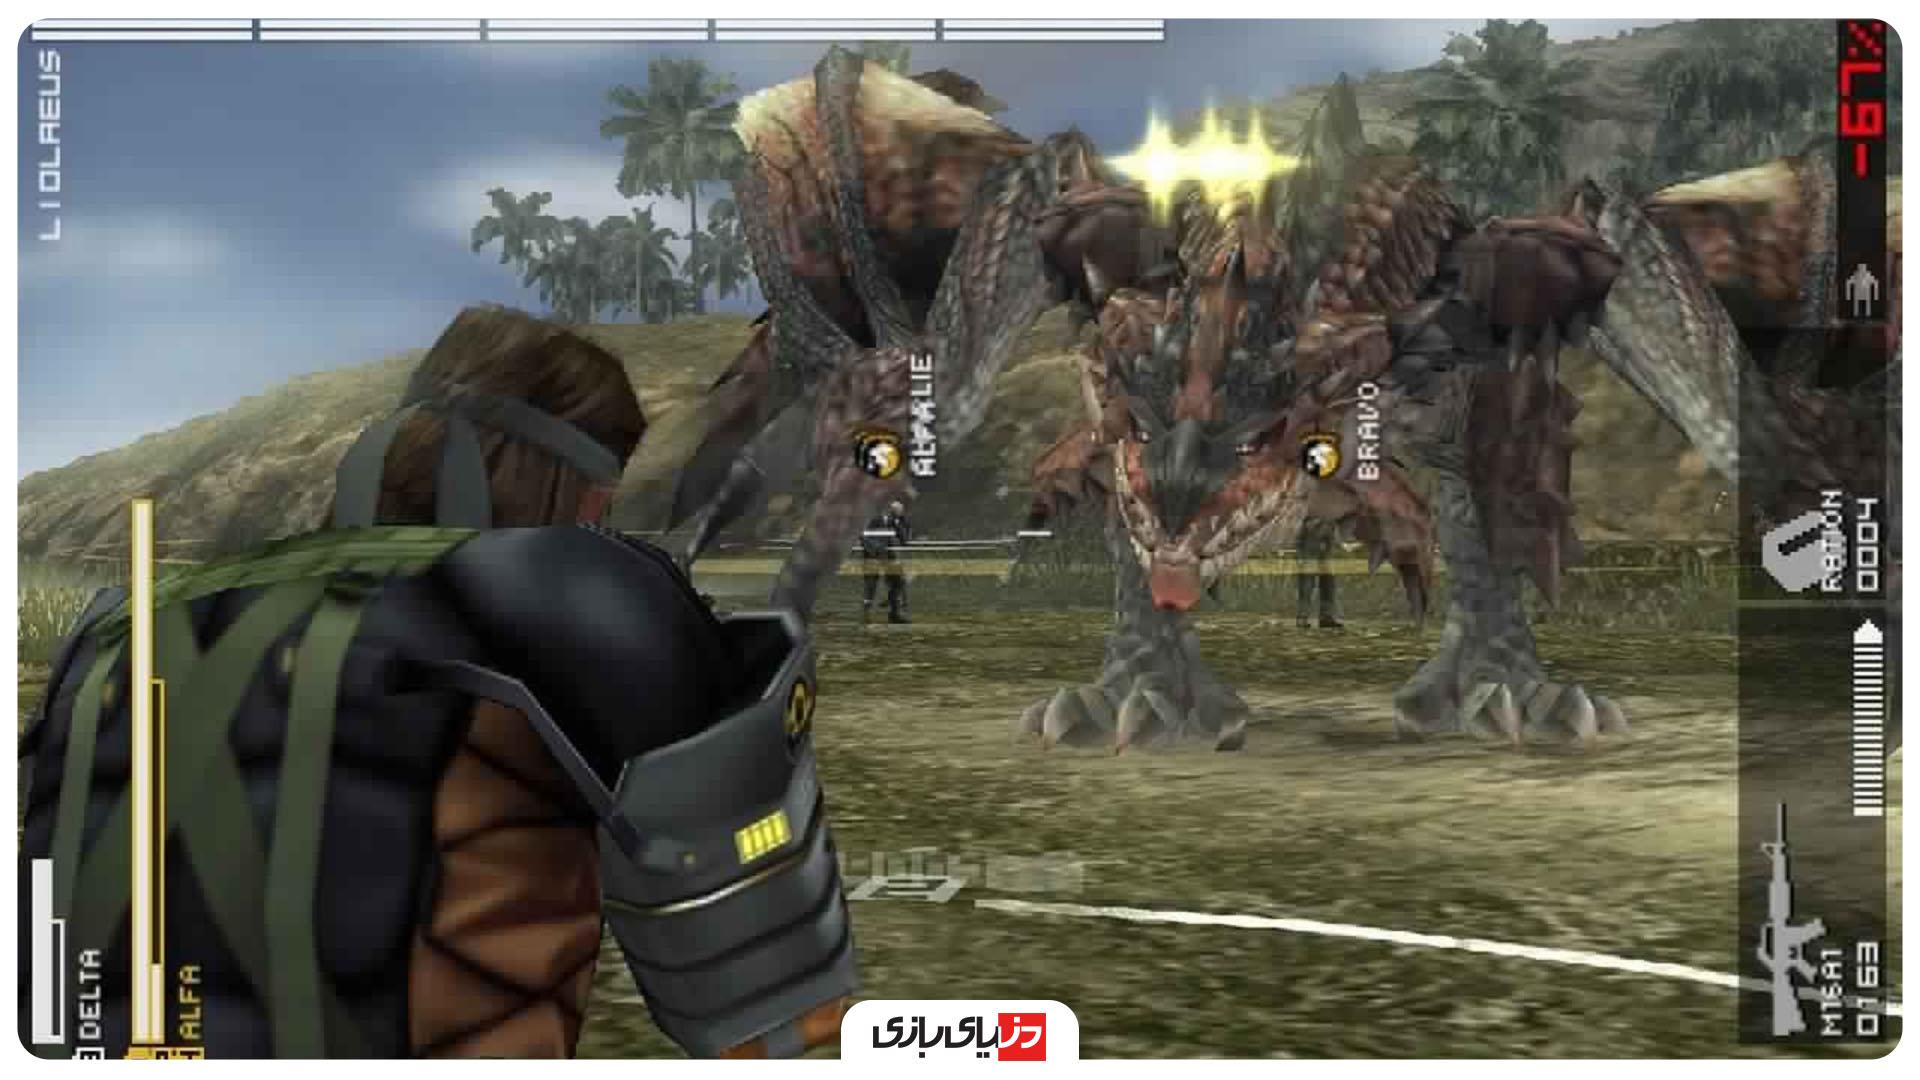 حقایق جالب سری Metal Gear Solid - Moster Hunter